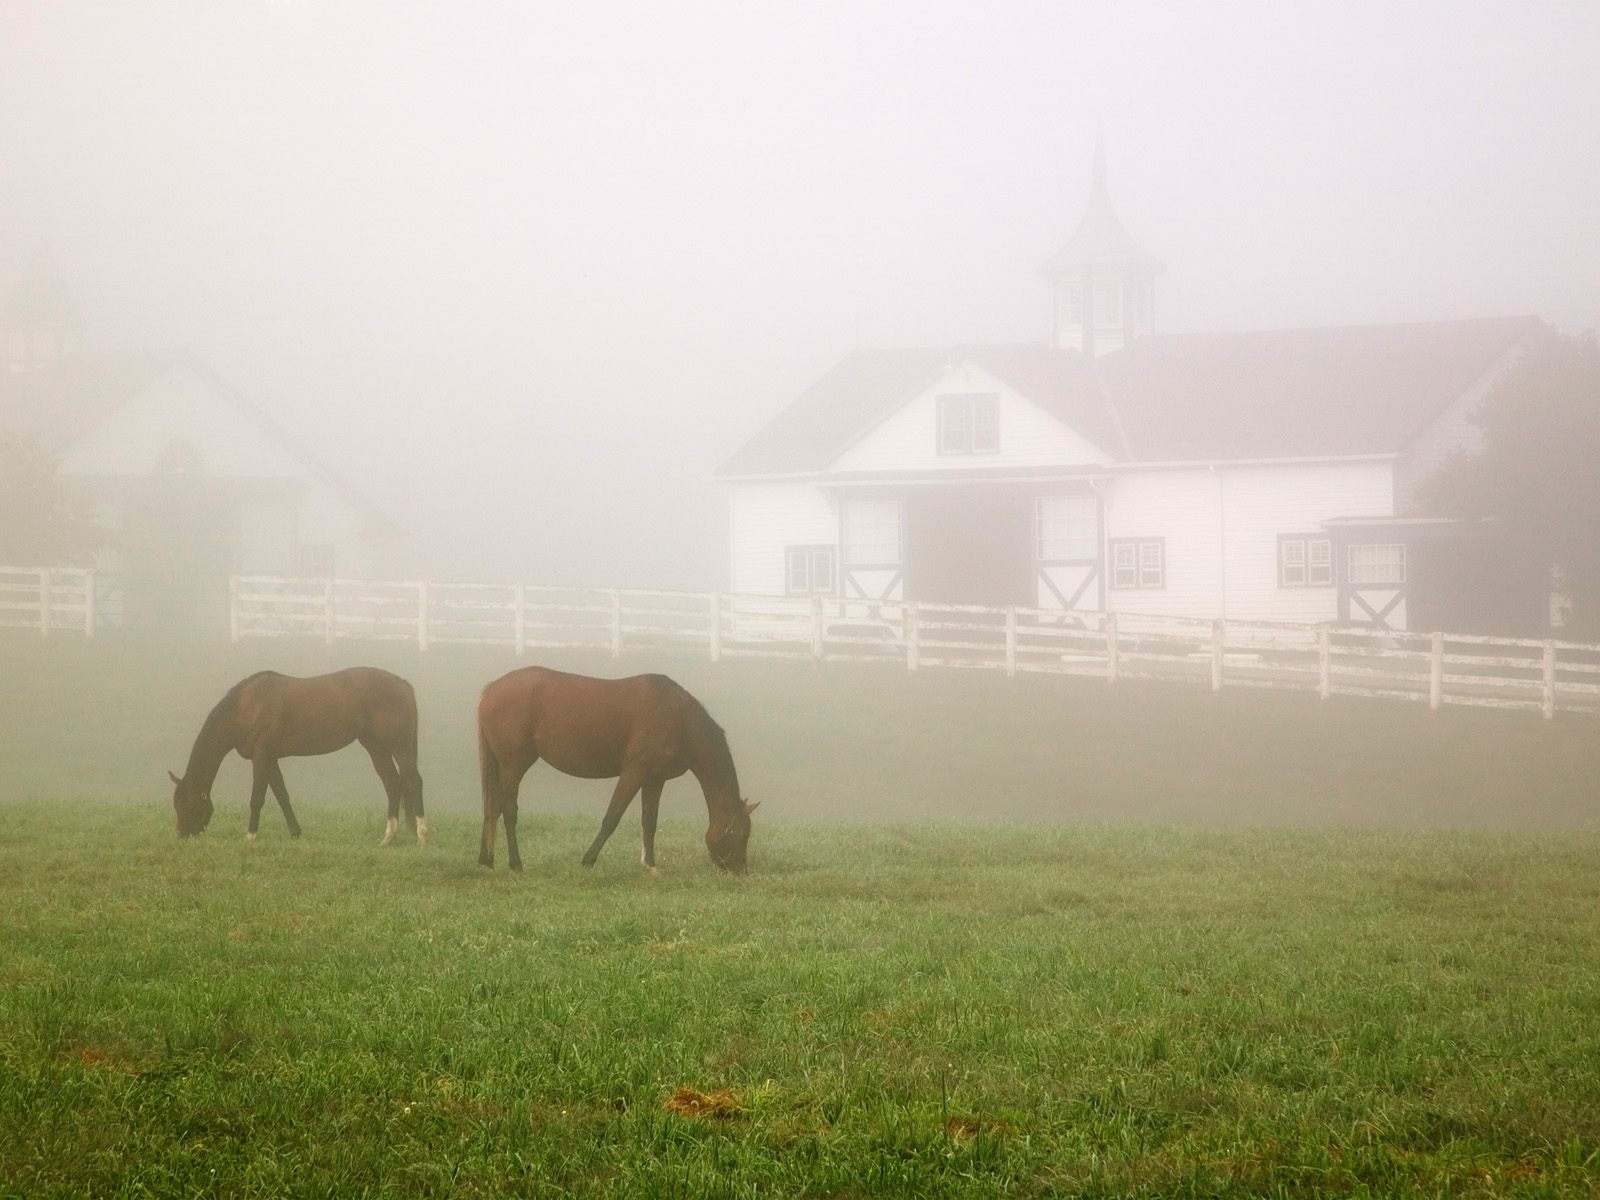 HQ Manchester Horse Farm Lexington Kentucky Wallpaper   HQ 1600x1200